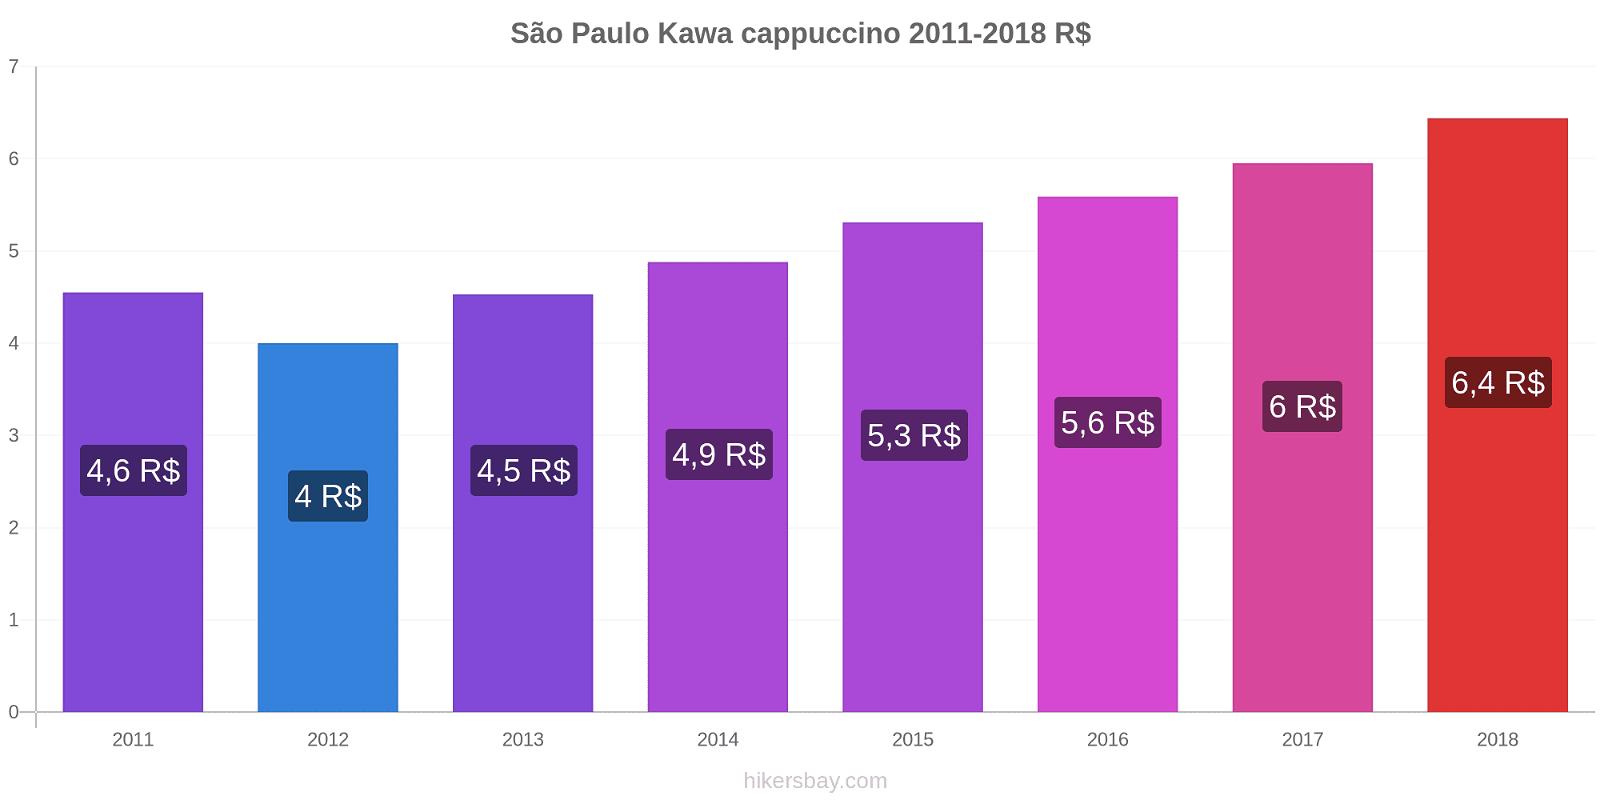 São Paulo zmiany cen Kawa cappuccino hikersbay.com